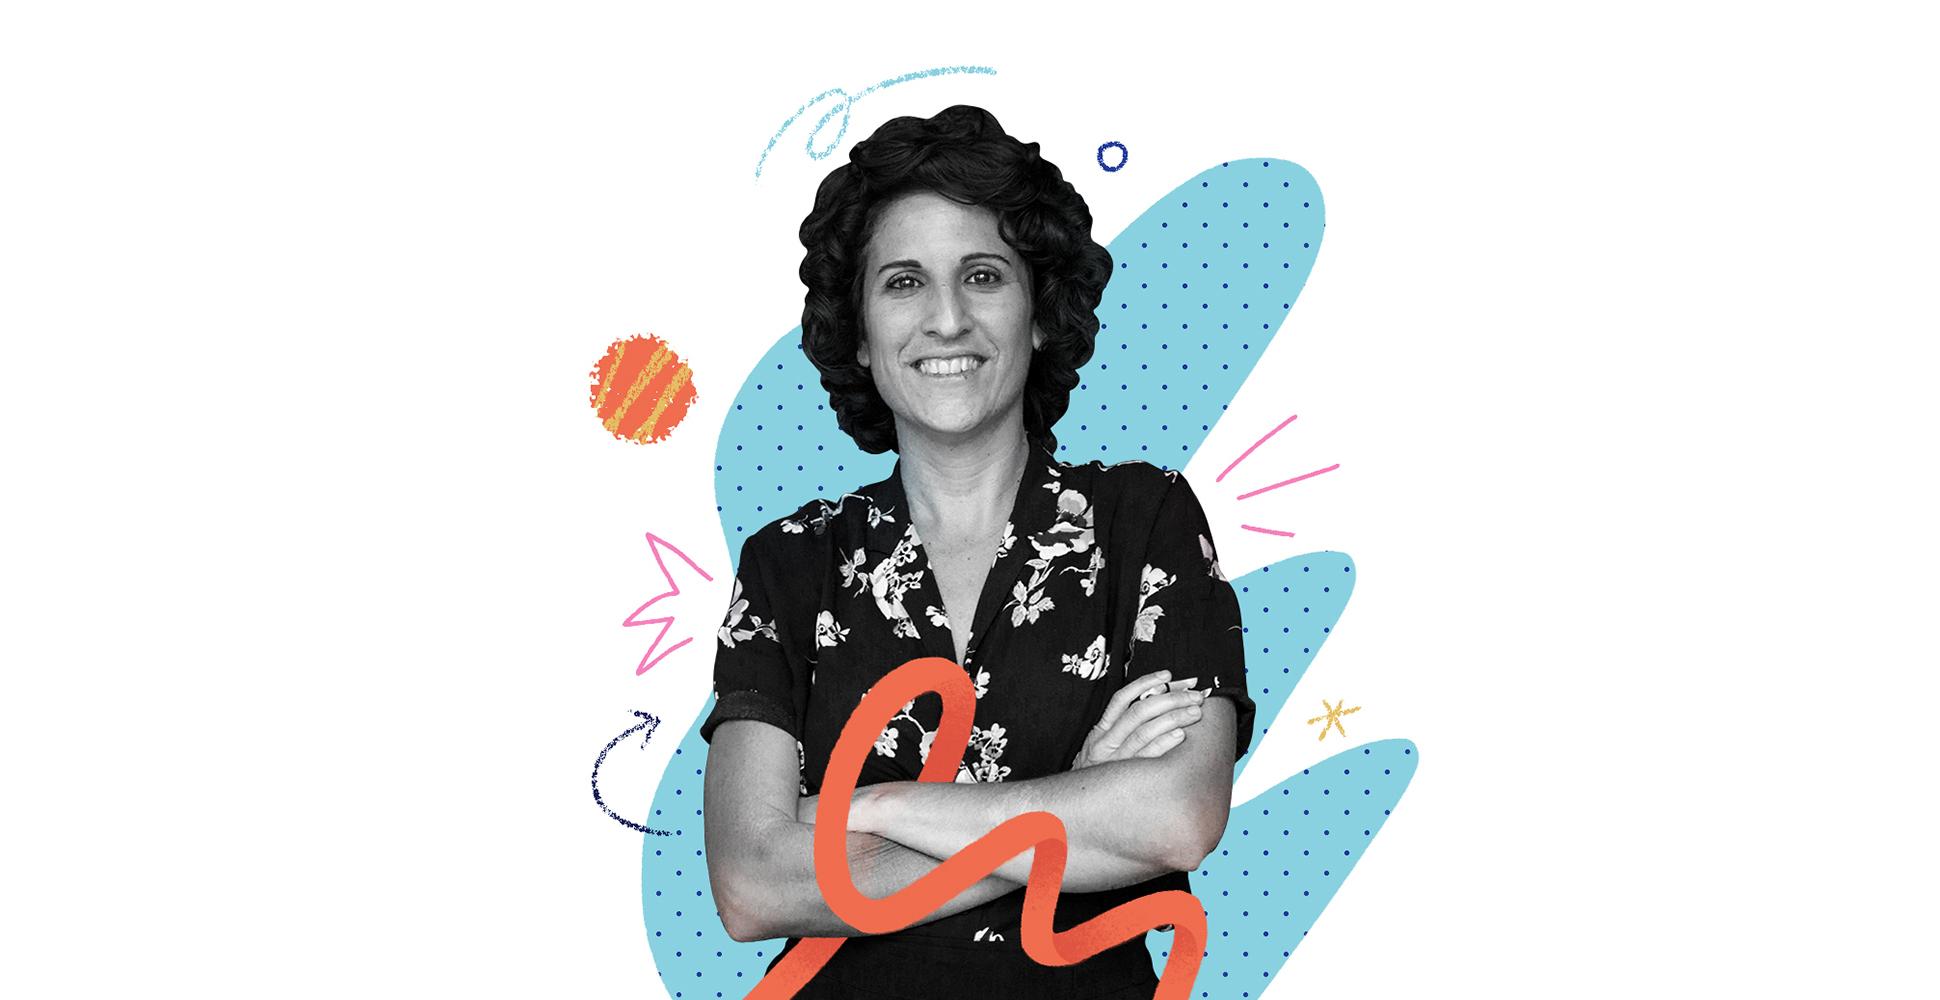 Laura de la Calle, Producer at Z1